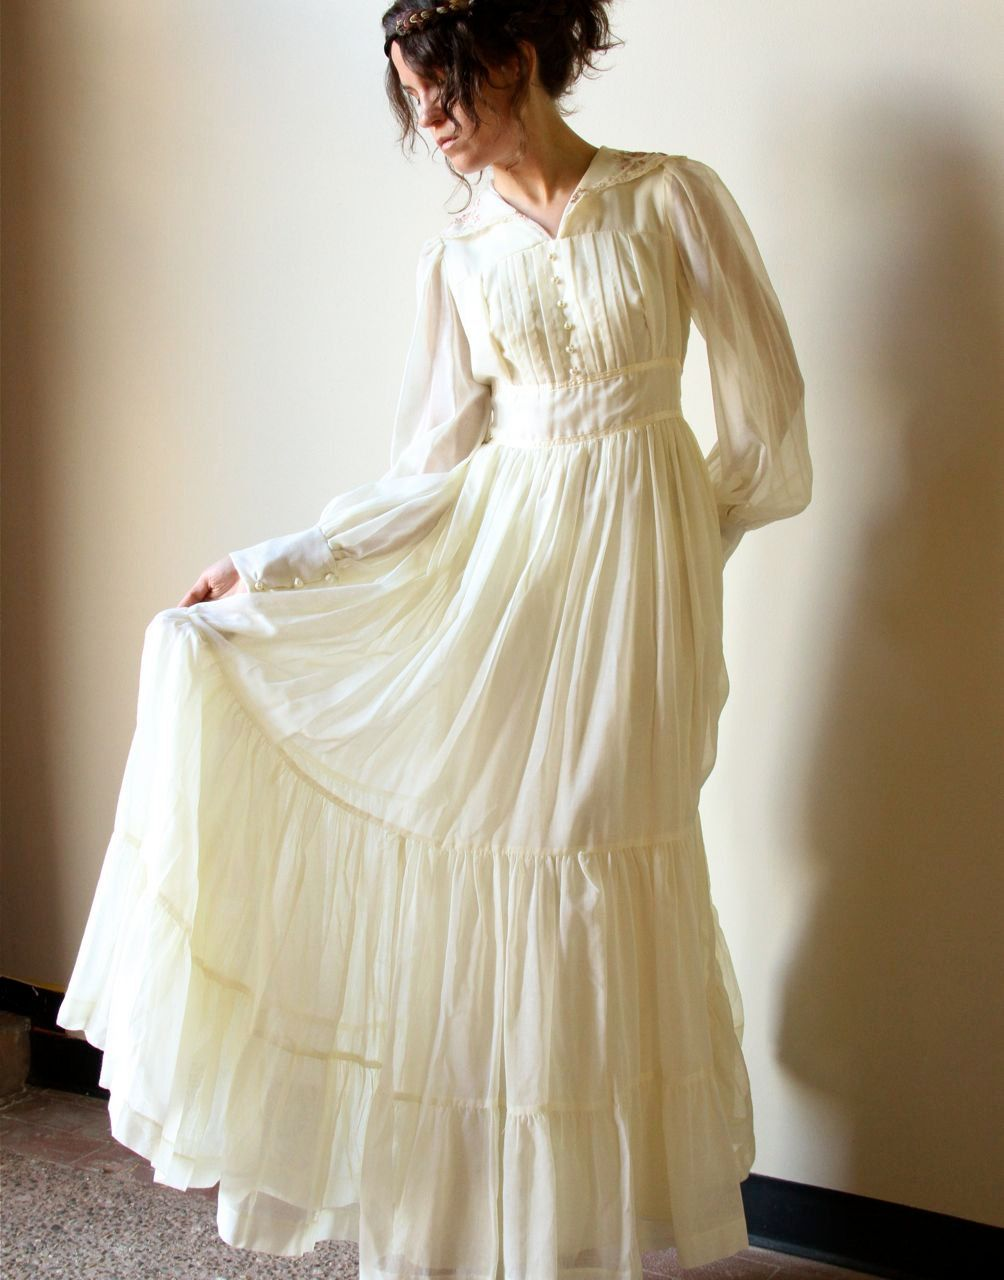 70s Gunne Sax Boho Wedding Dress Vintage Ivory By Factoryhandbook 170 00 Via Et White Cotton Wedding Dress Vintage Wedding Dress Boho Cotton Wedding Dresses [ 1280 x 1004 Pixel ]